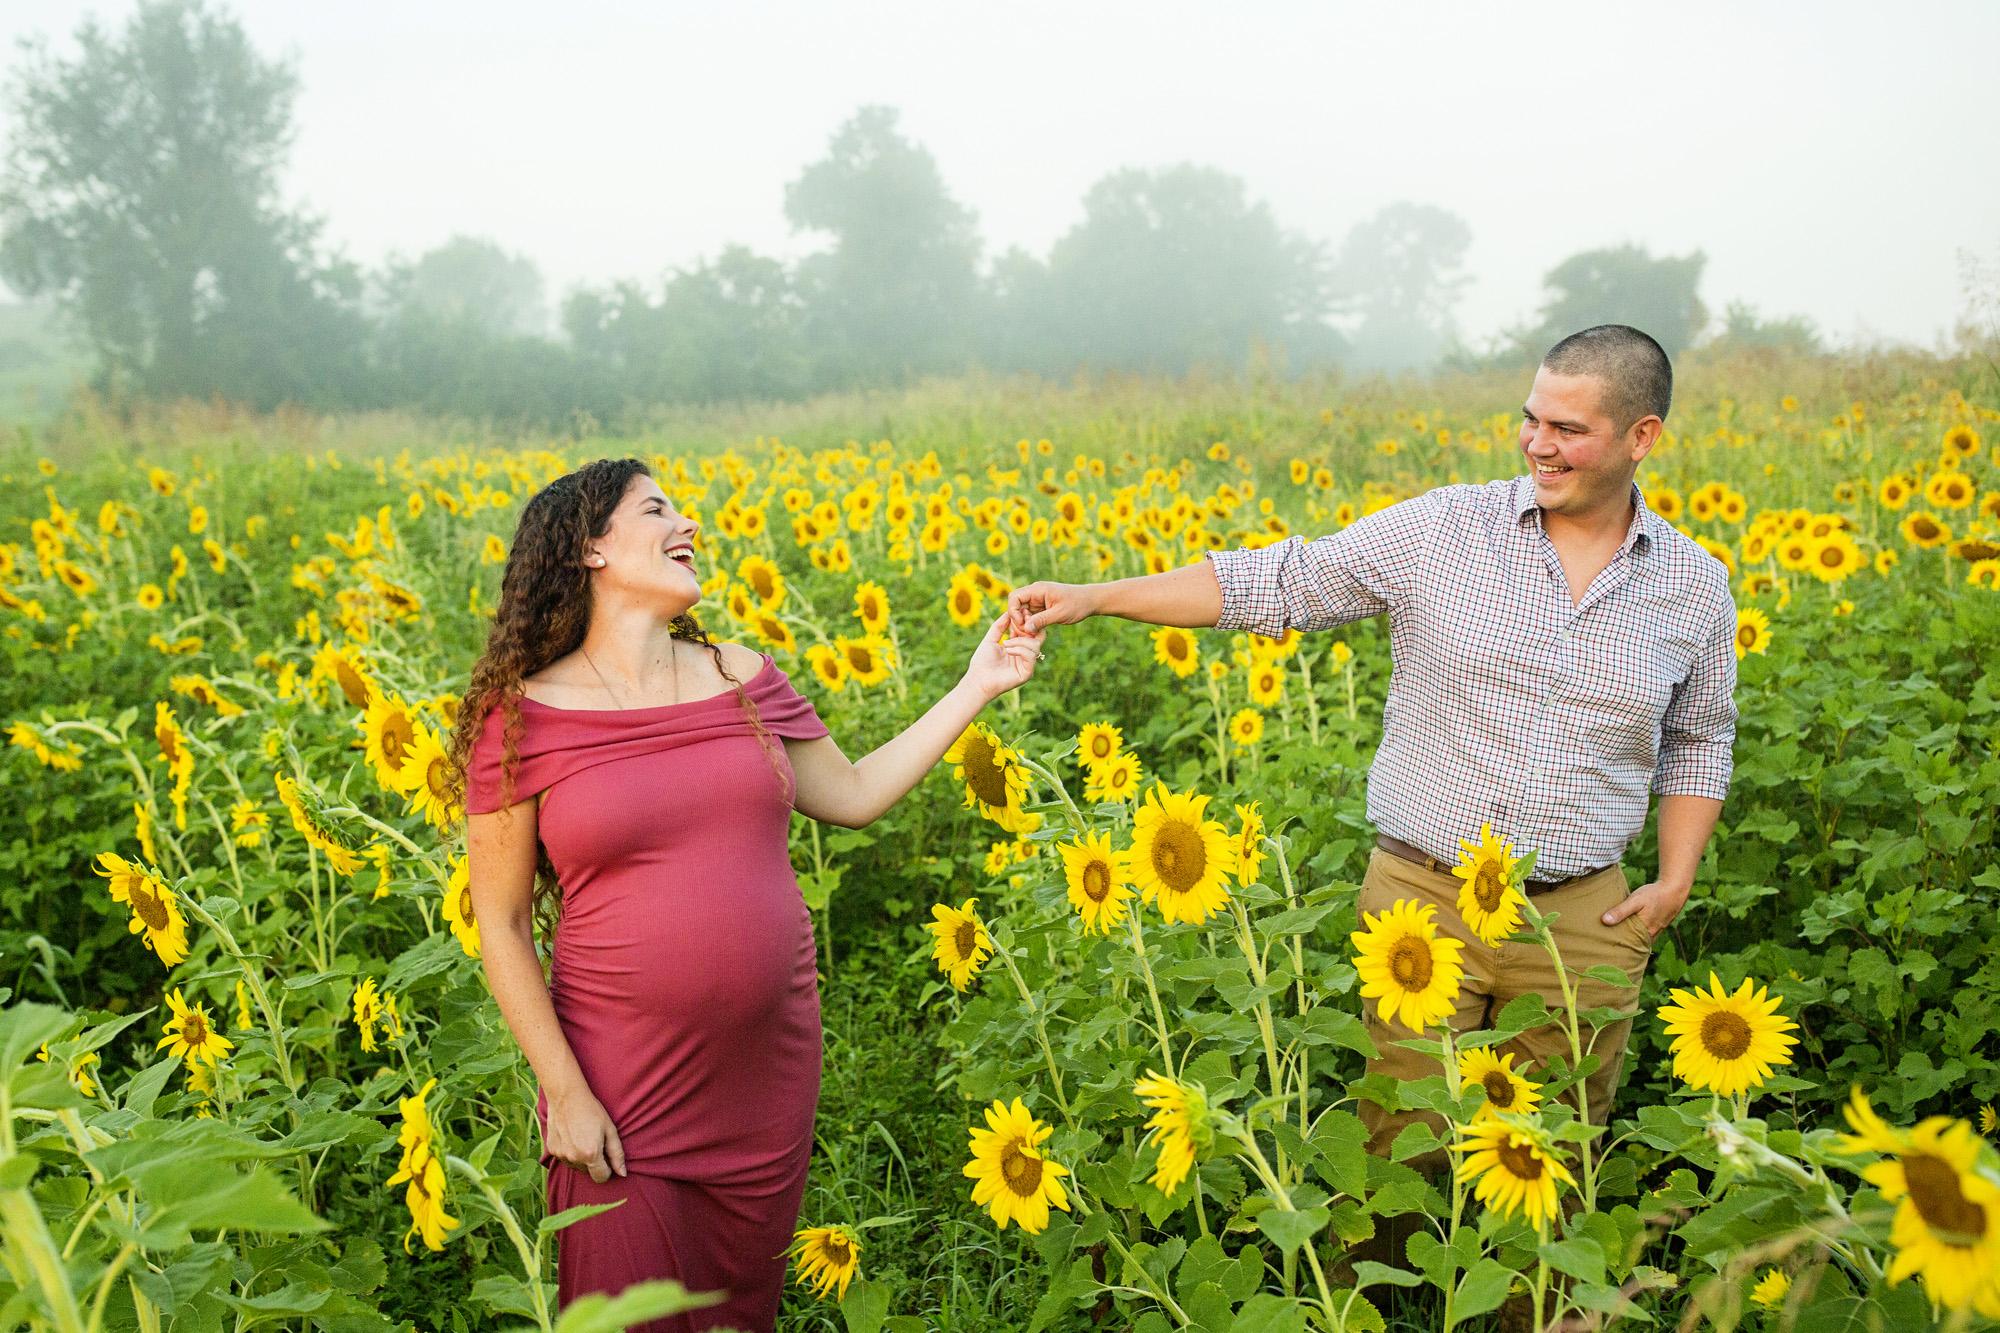 Seriously_Sabrina_Photography_Lexington_Frankfort_Kentucky_Maternity_Mini_Sunflowers_Johns14.jpg